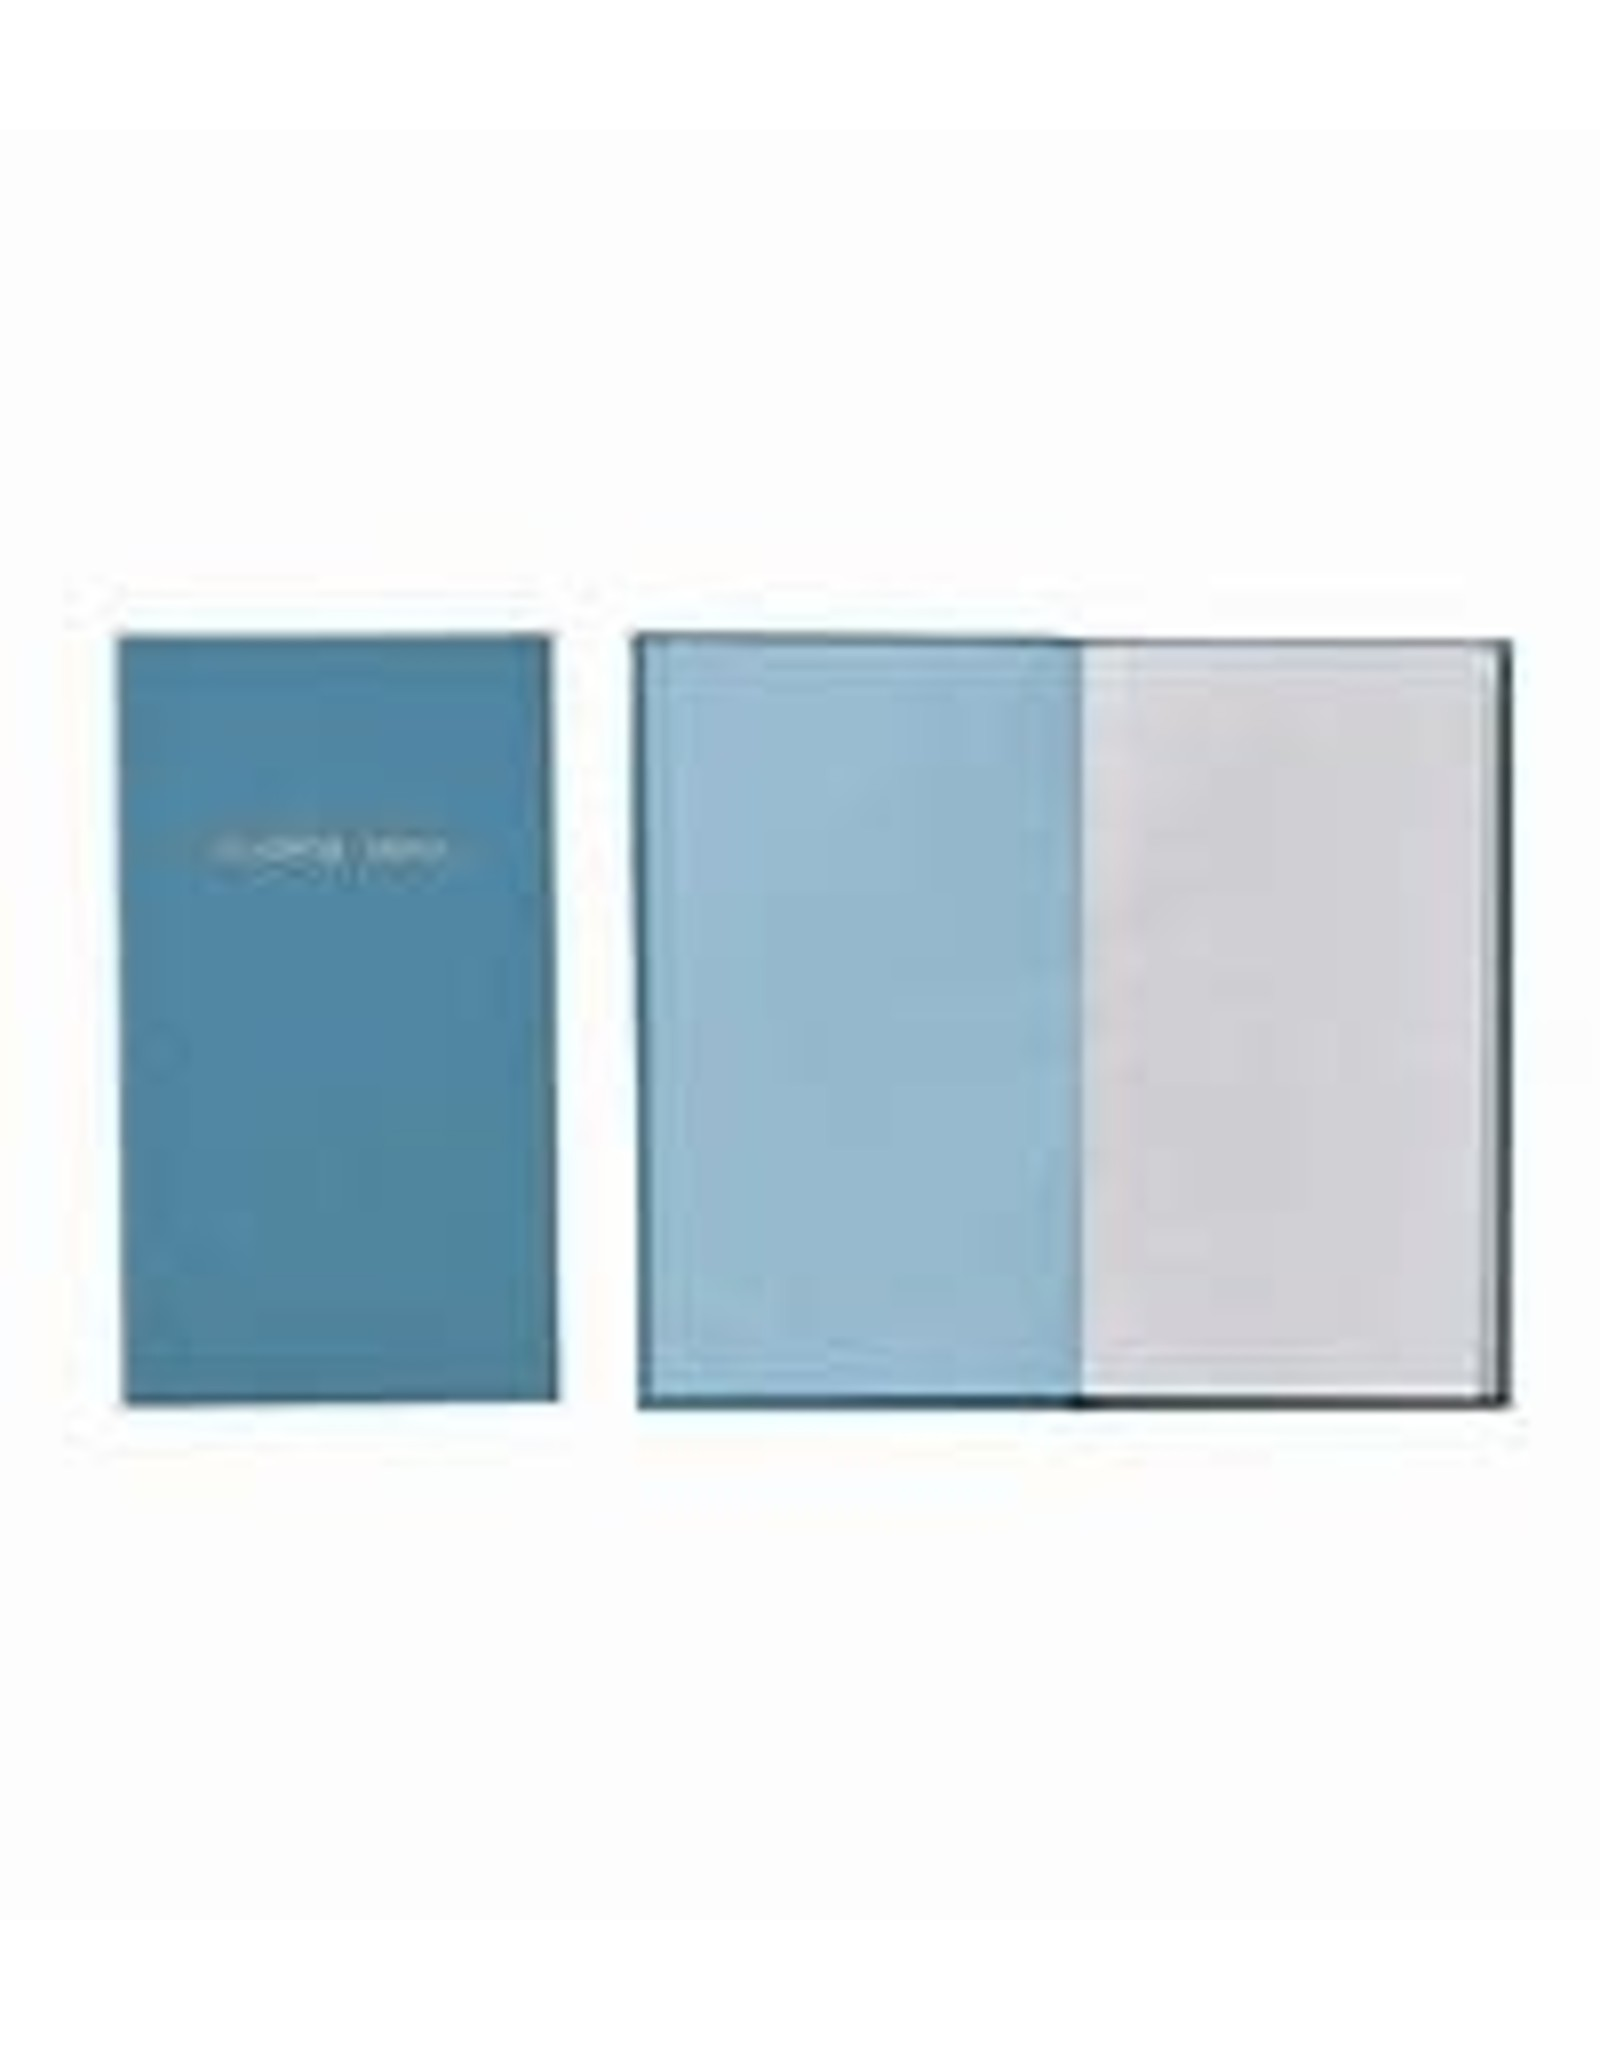 KOKUYO KOKUYO SKETCH BOOK BLUE